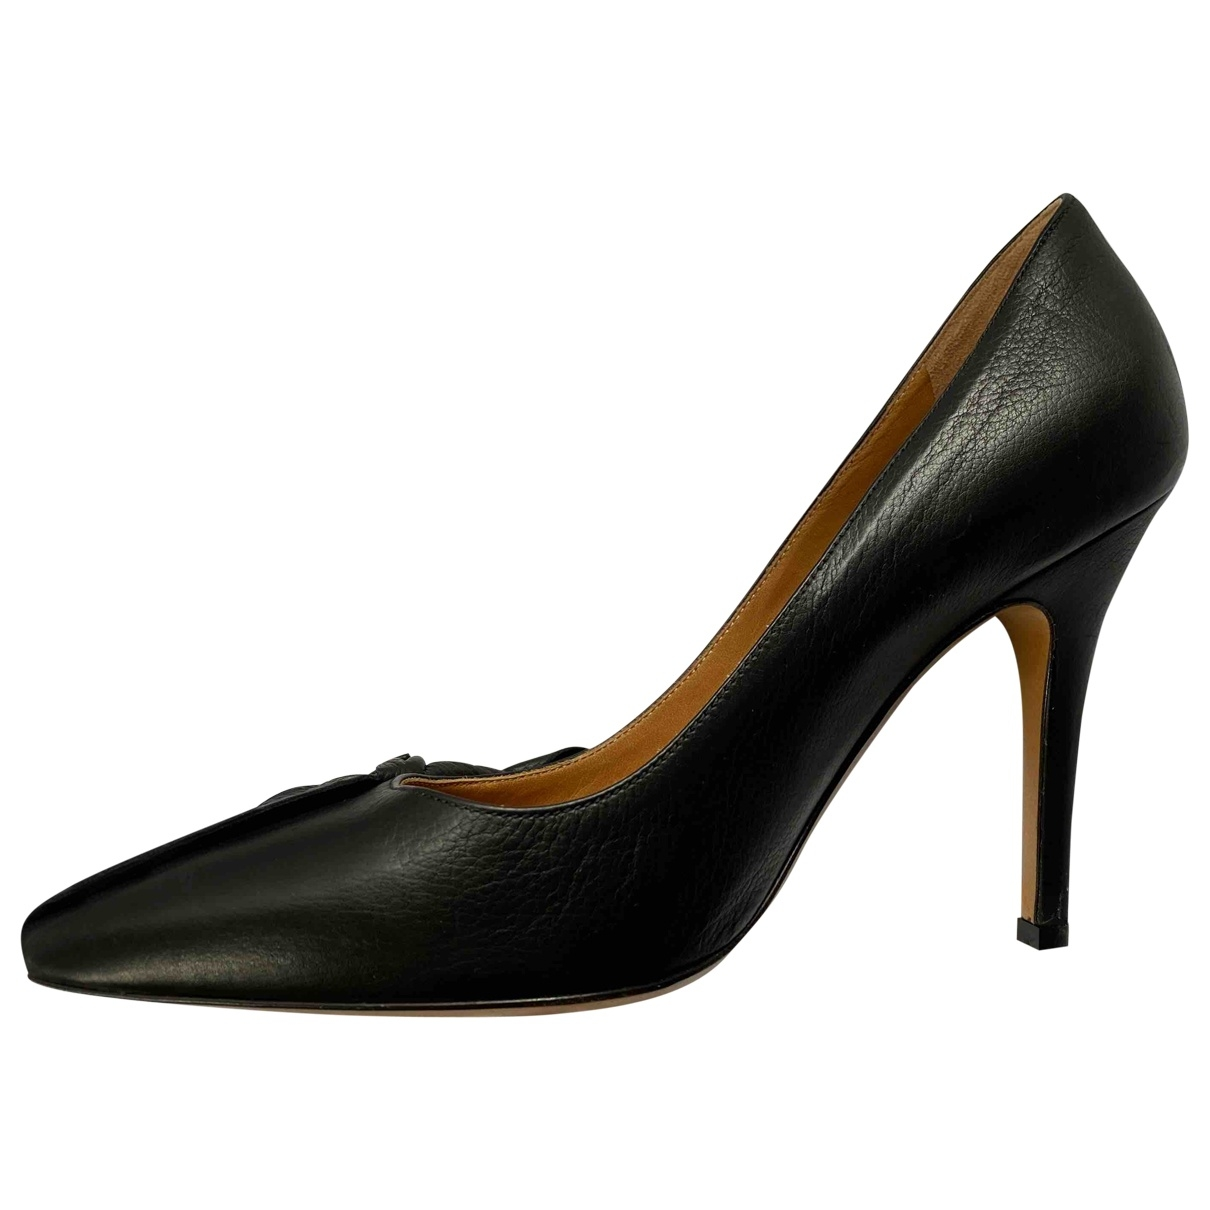 Isabel Marant \N Black Leather Heels for Women 38 EU